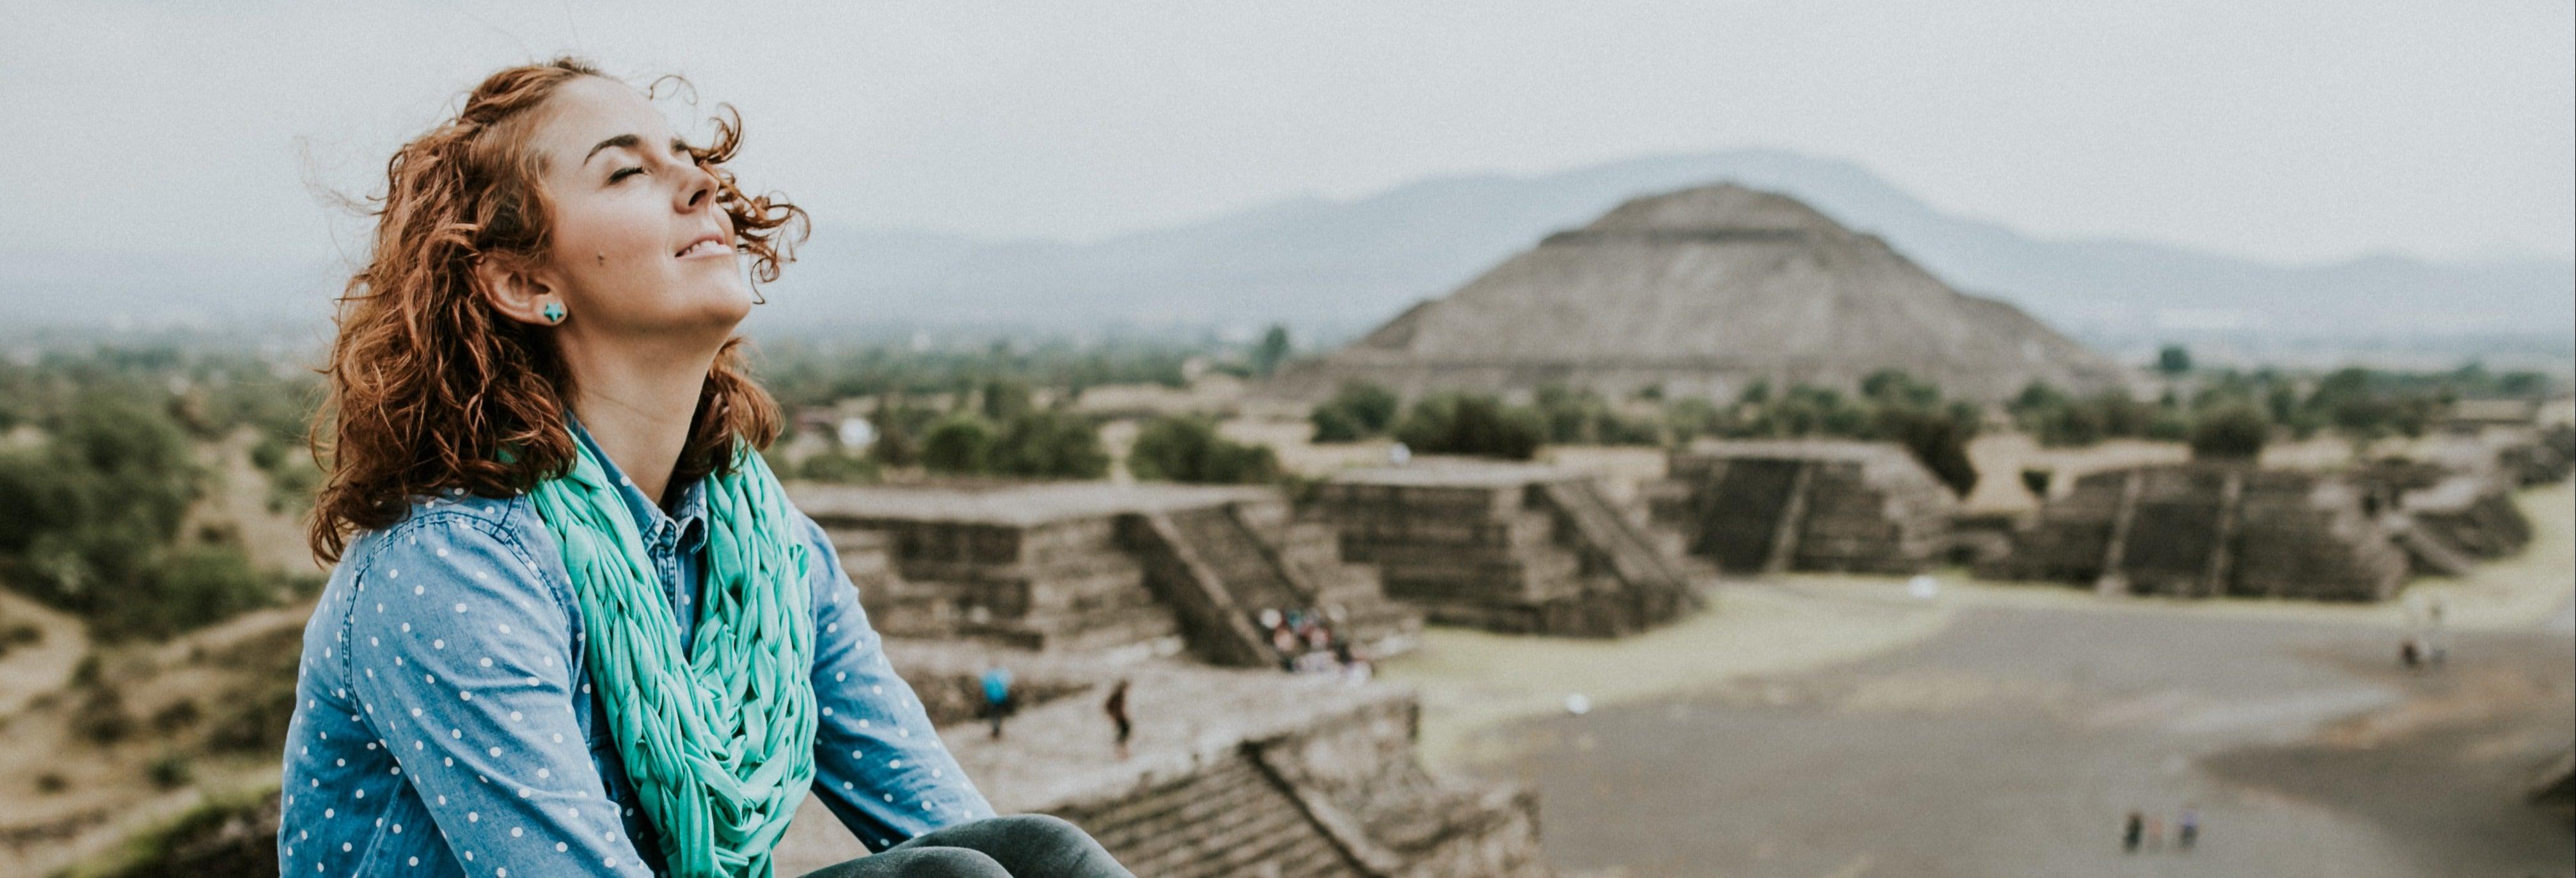 Excursión a Teotihuacán al atardecer